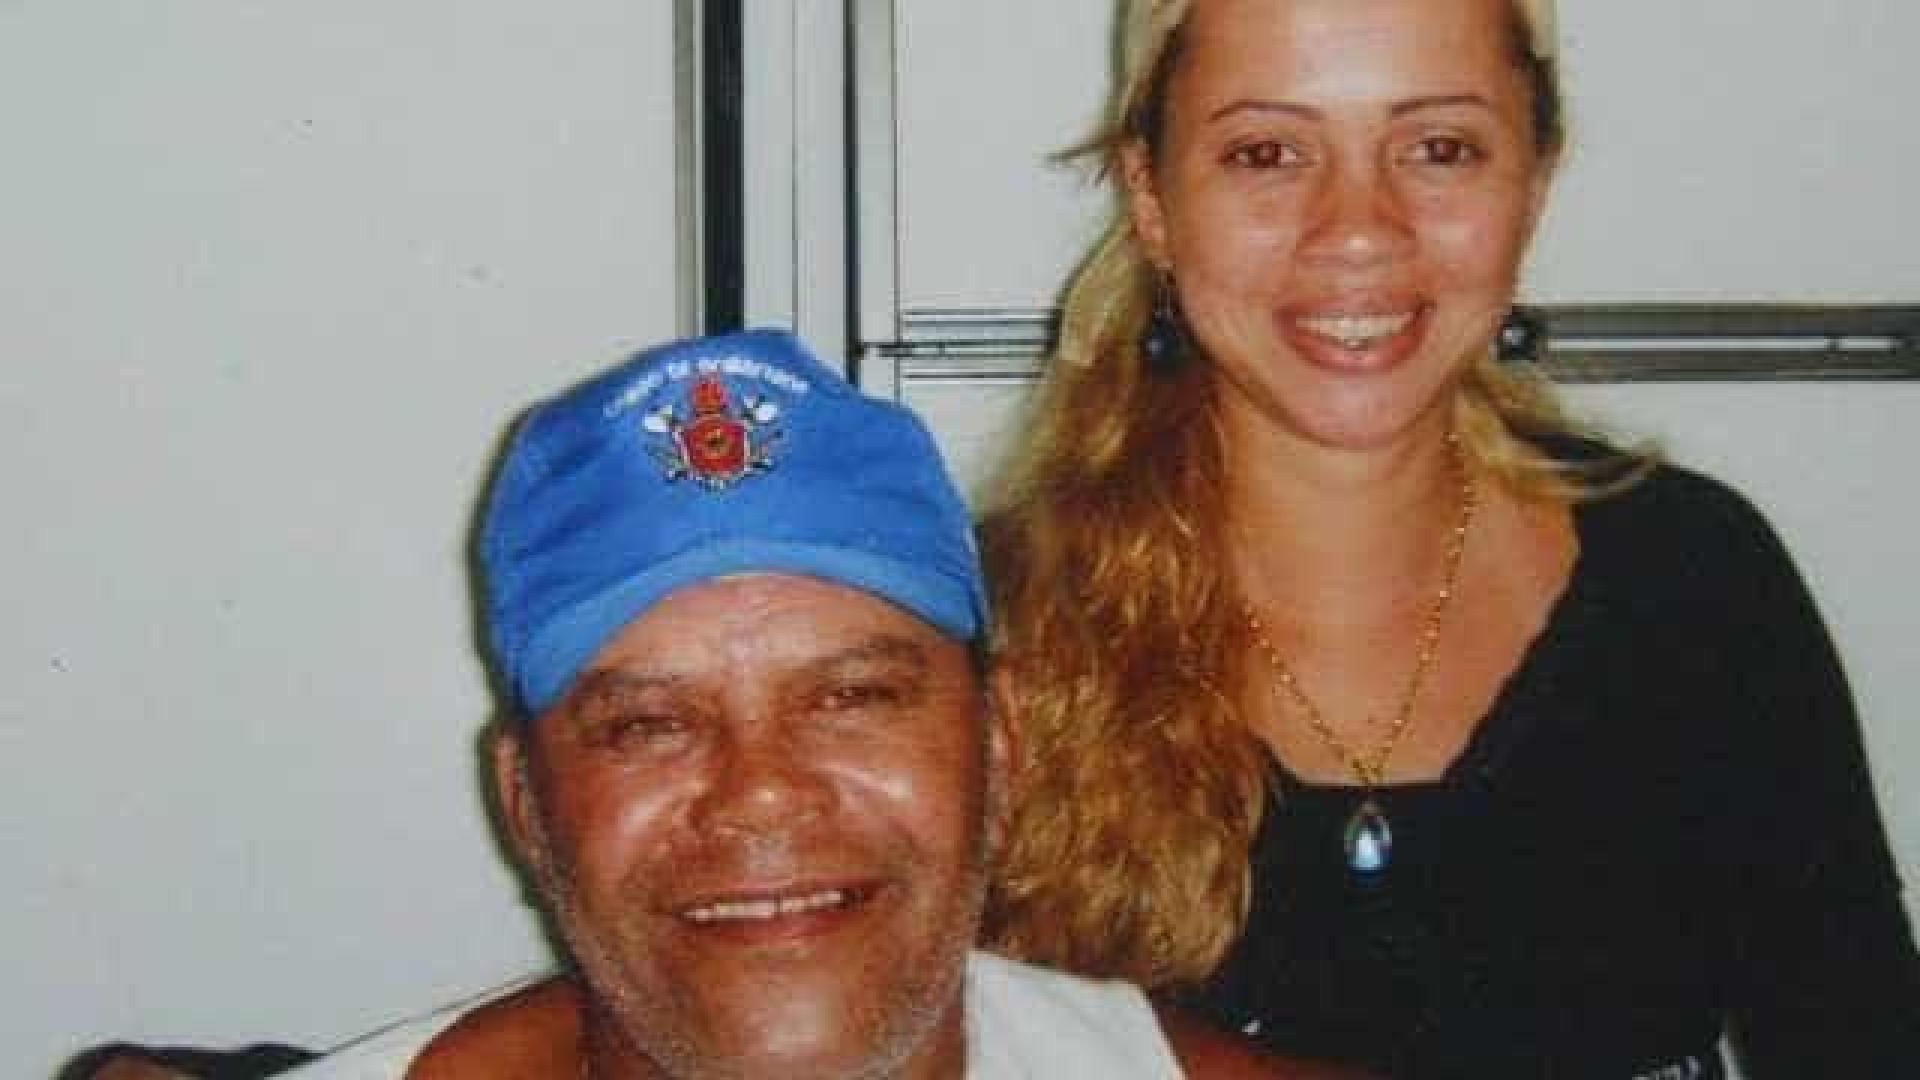 Justiça anula testamento de ganhador da Mega-Sena que beneficiava viúva